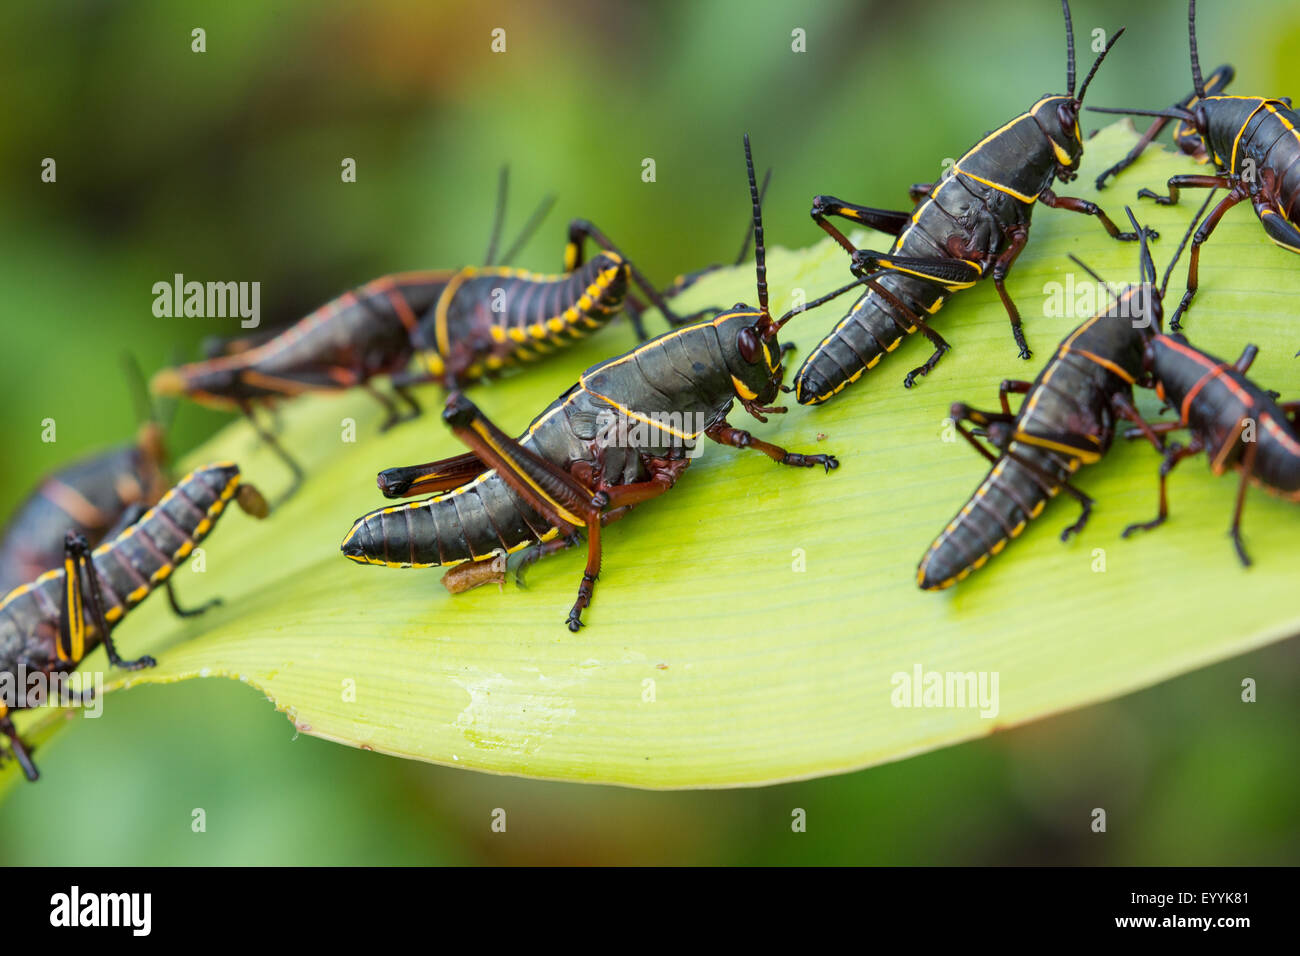 Eastern lubber grasshopper (Romalea microptera), several on feeding plant, USA, Florida - Stock Image